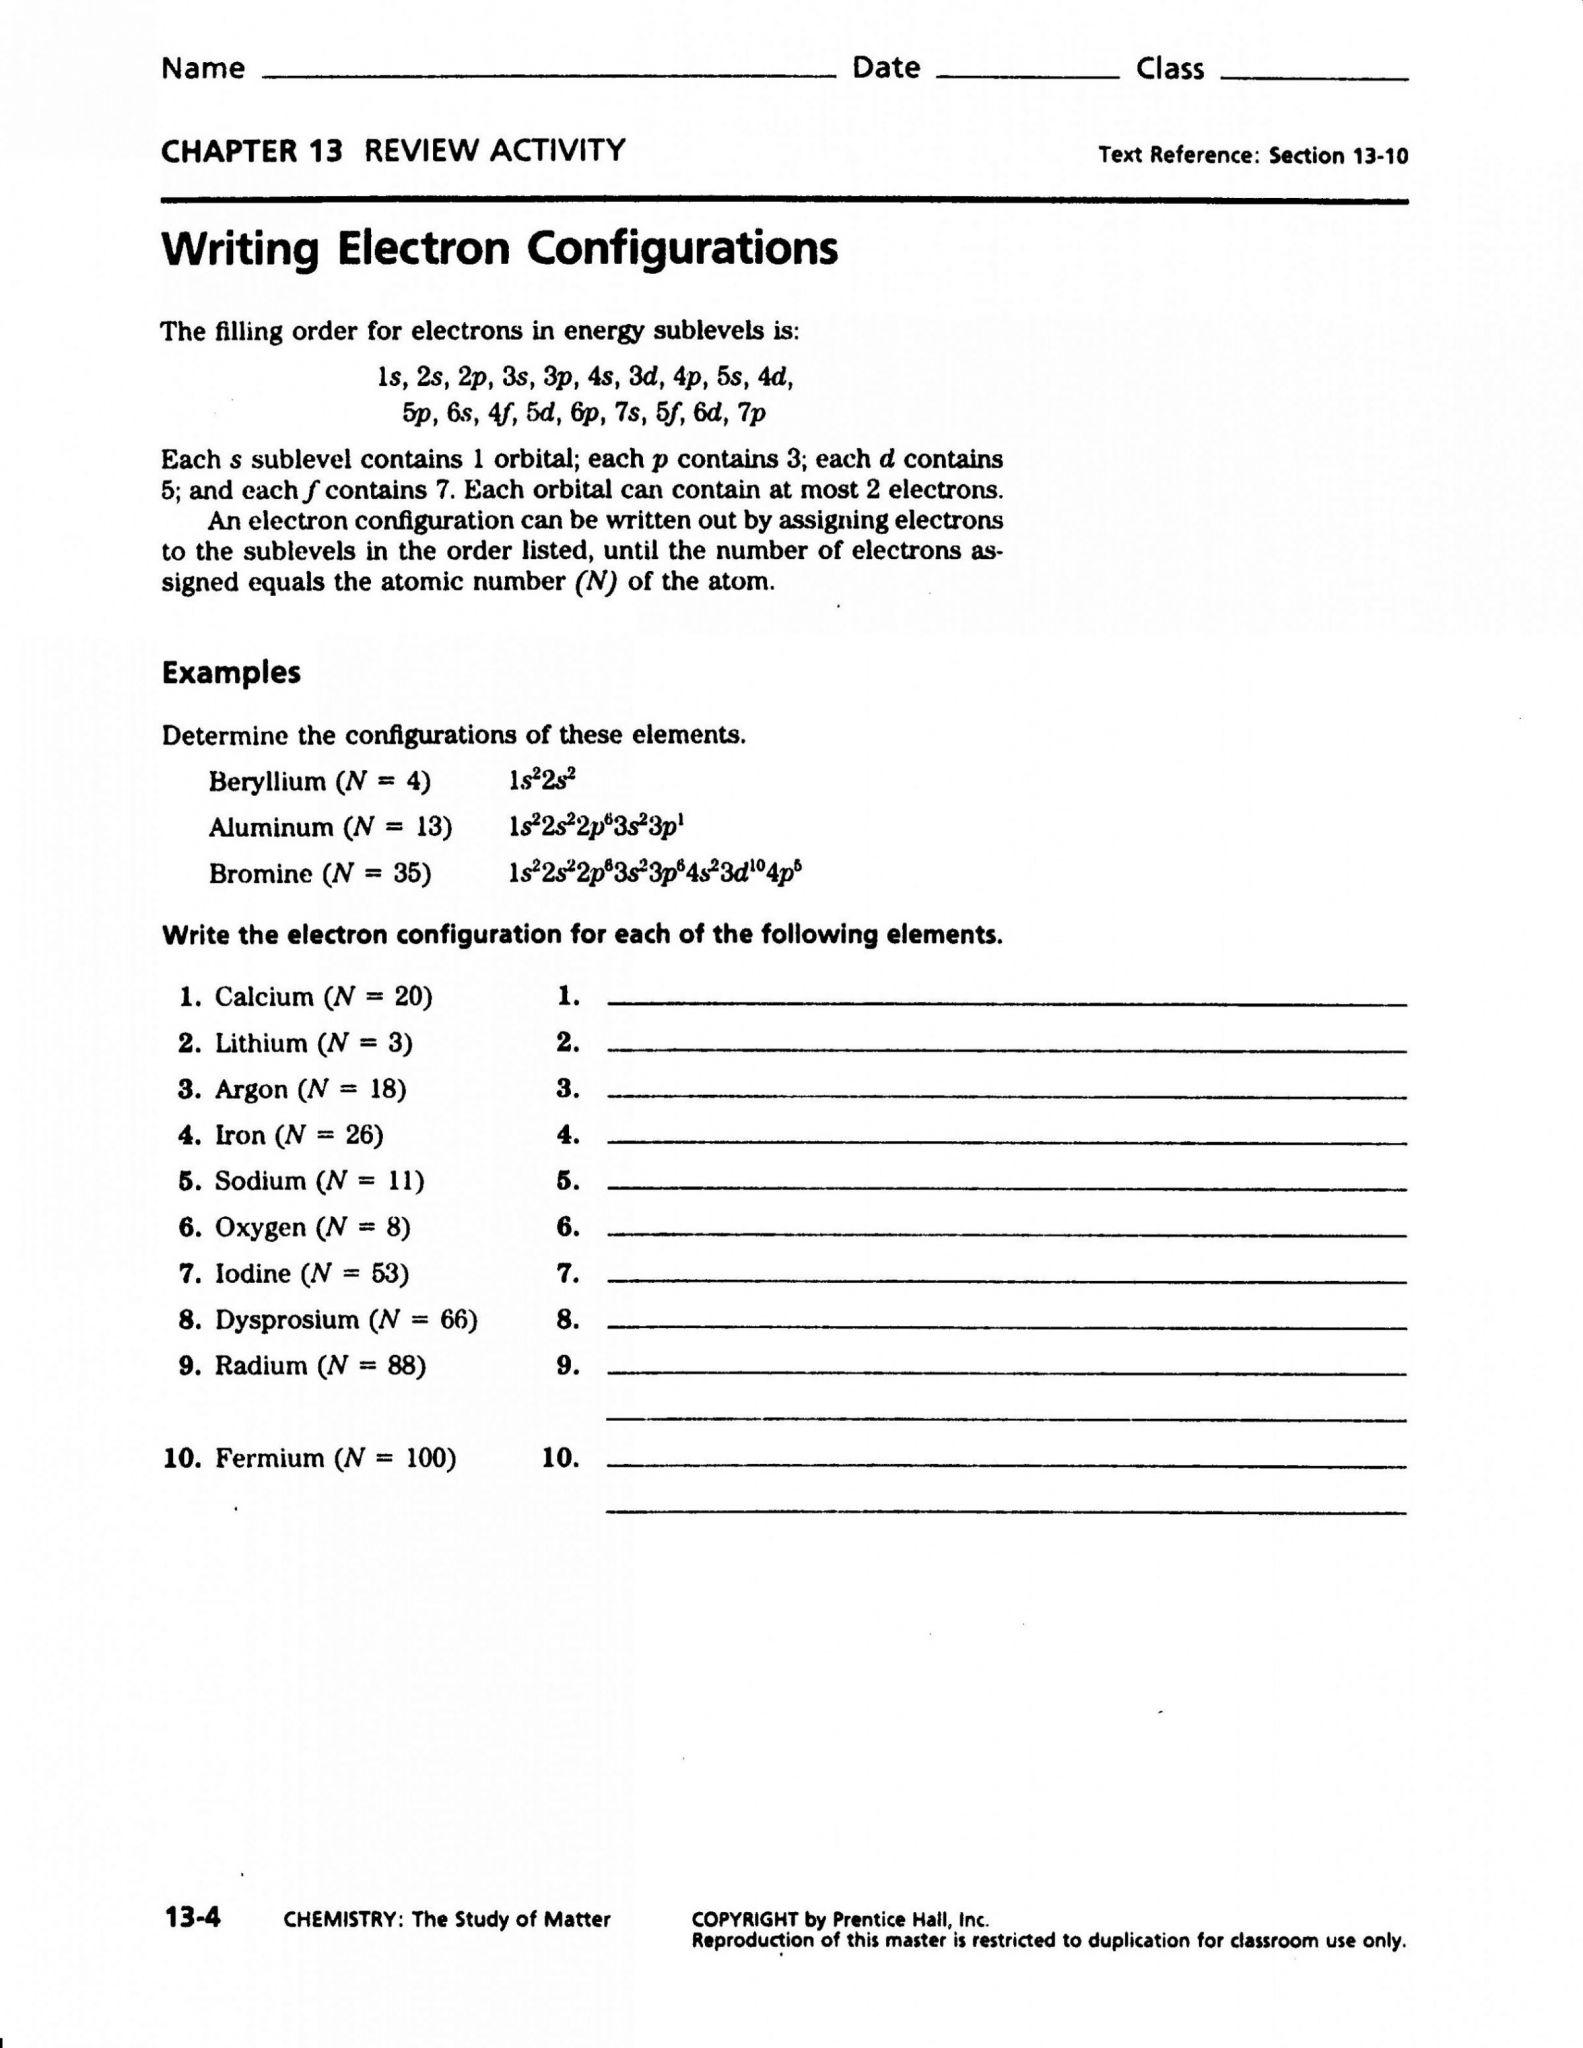 Protons Neutrons Electrons Atomic And Mass Worksheet